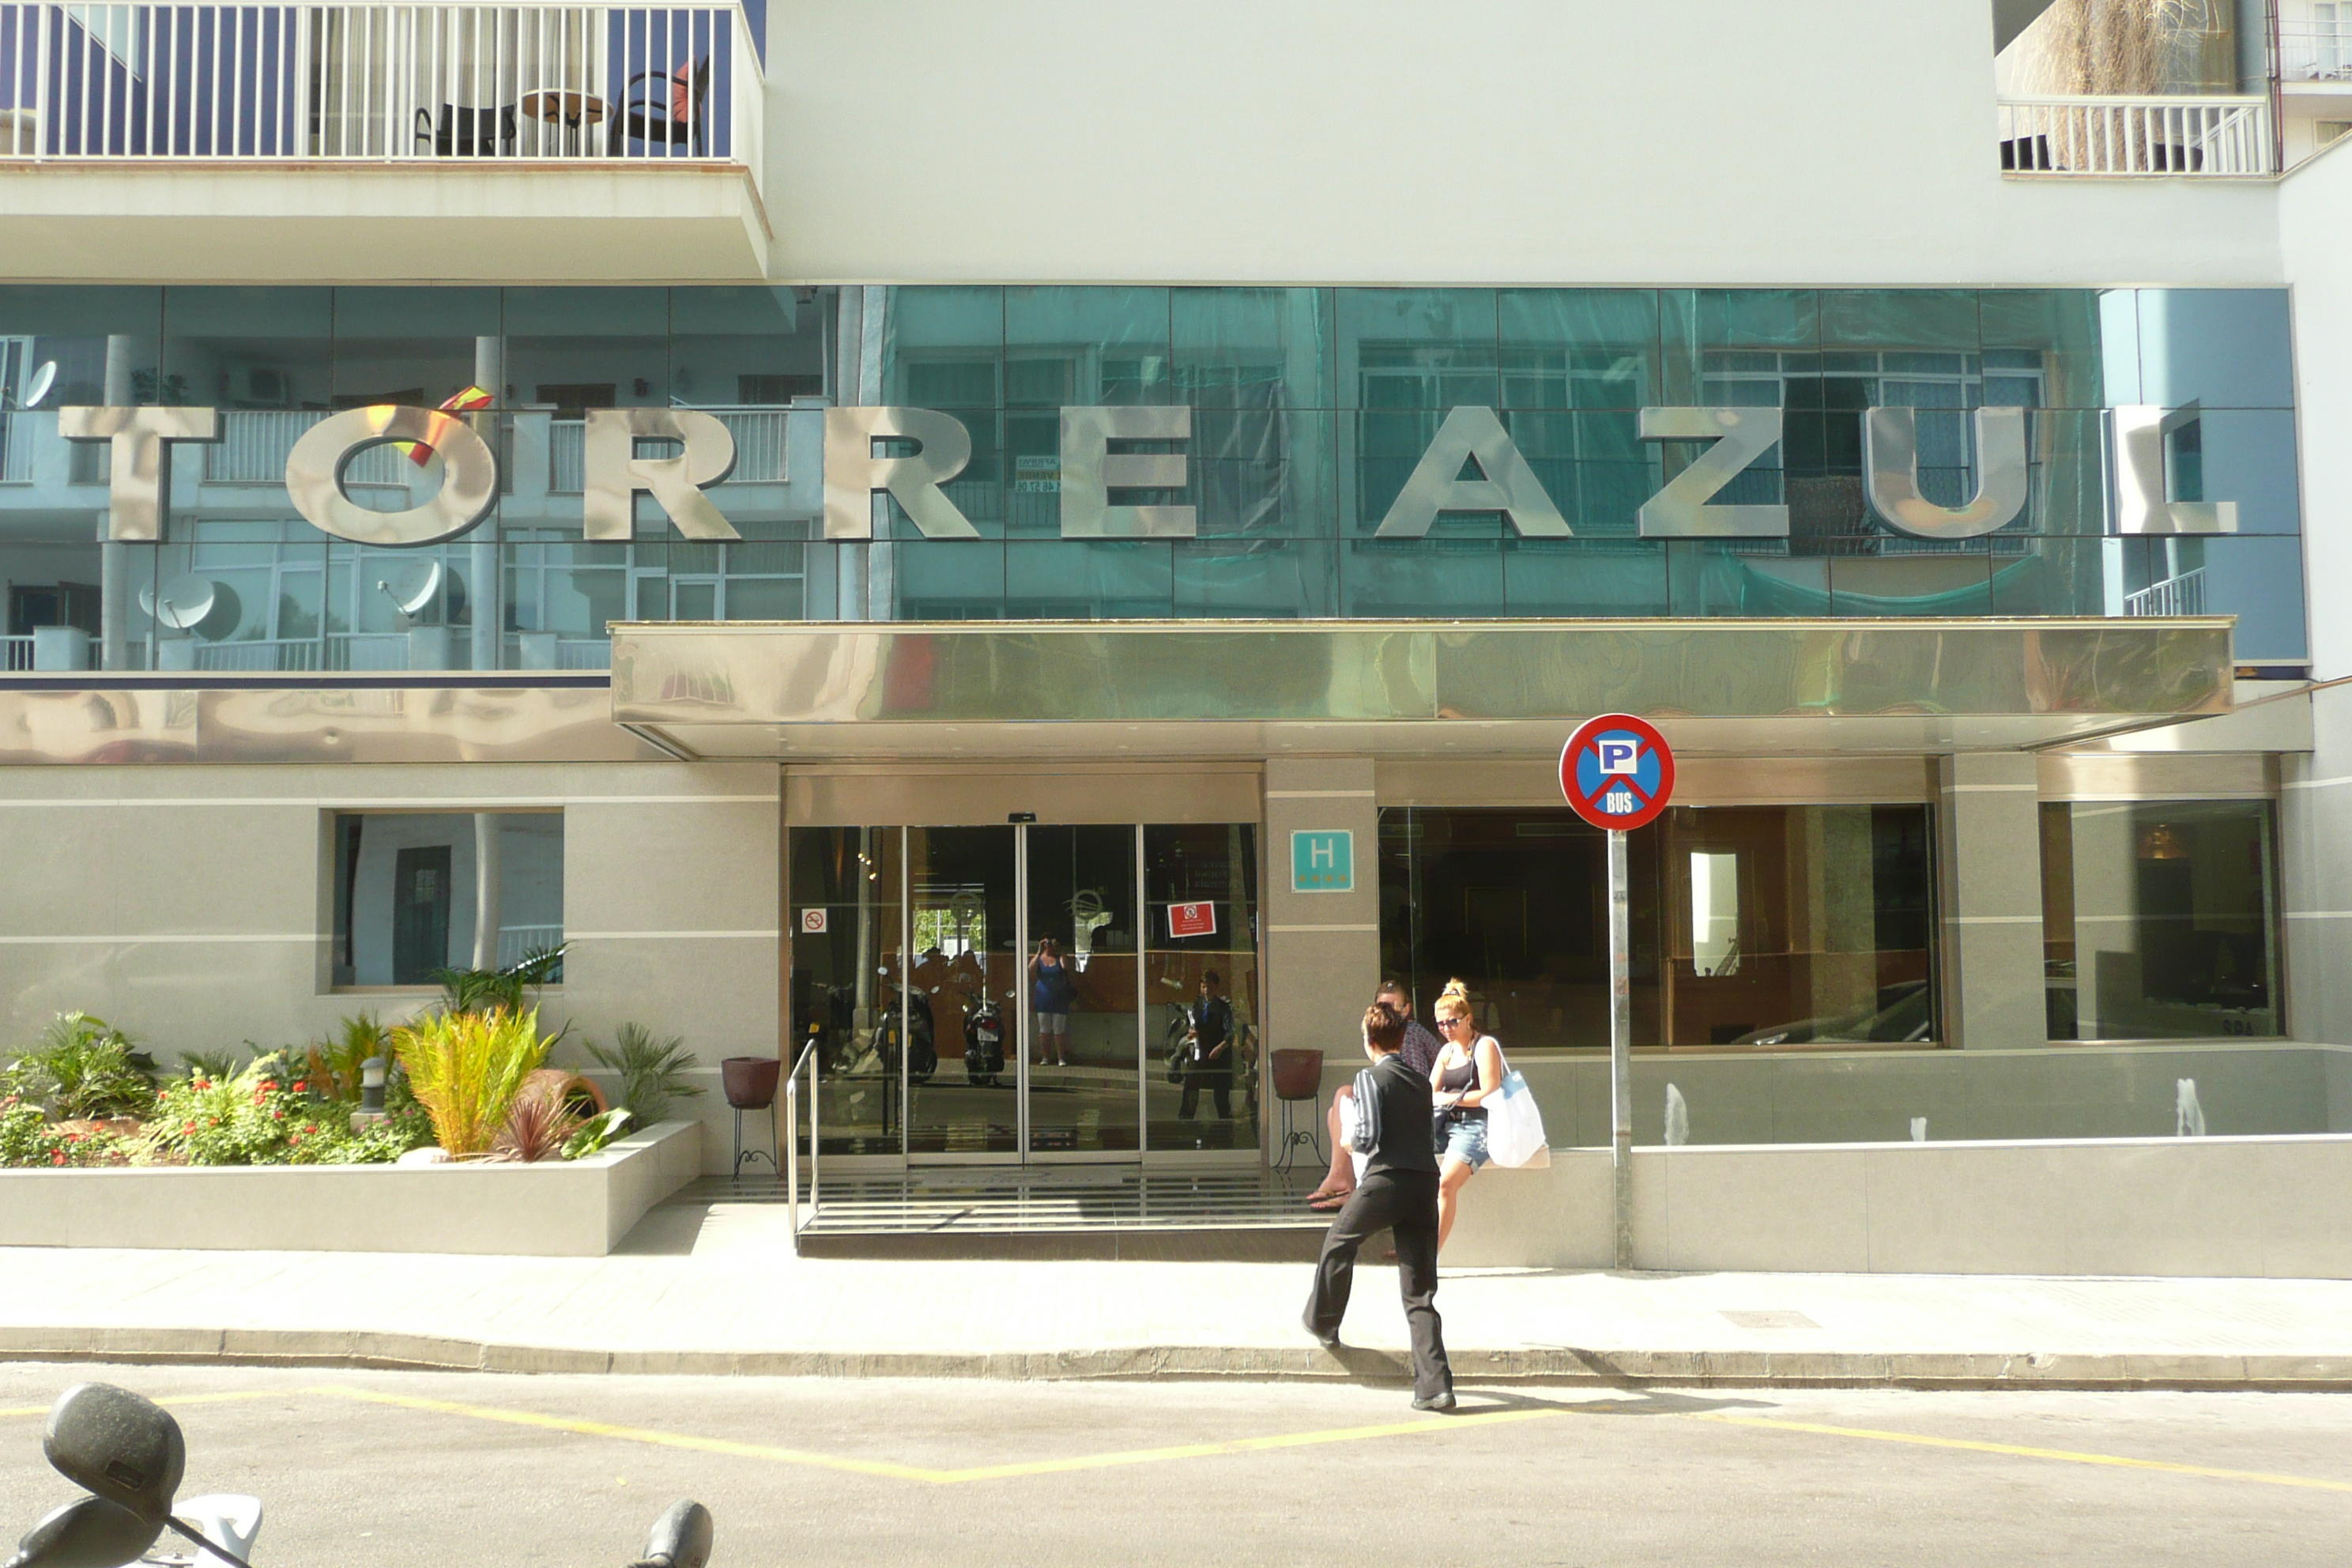 Hotel Torre Azul Bewertung